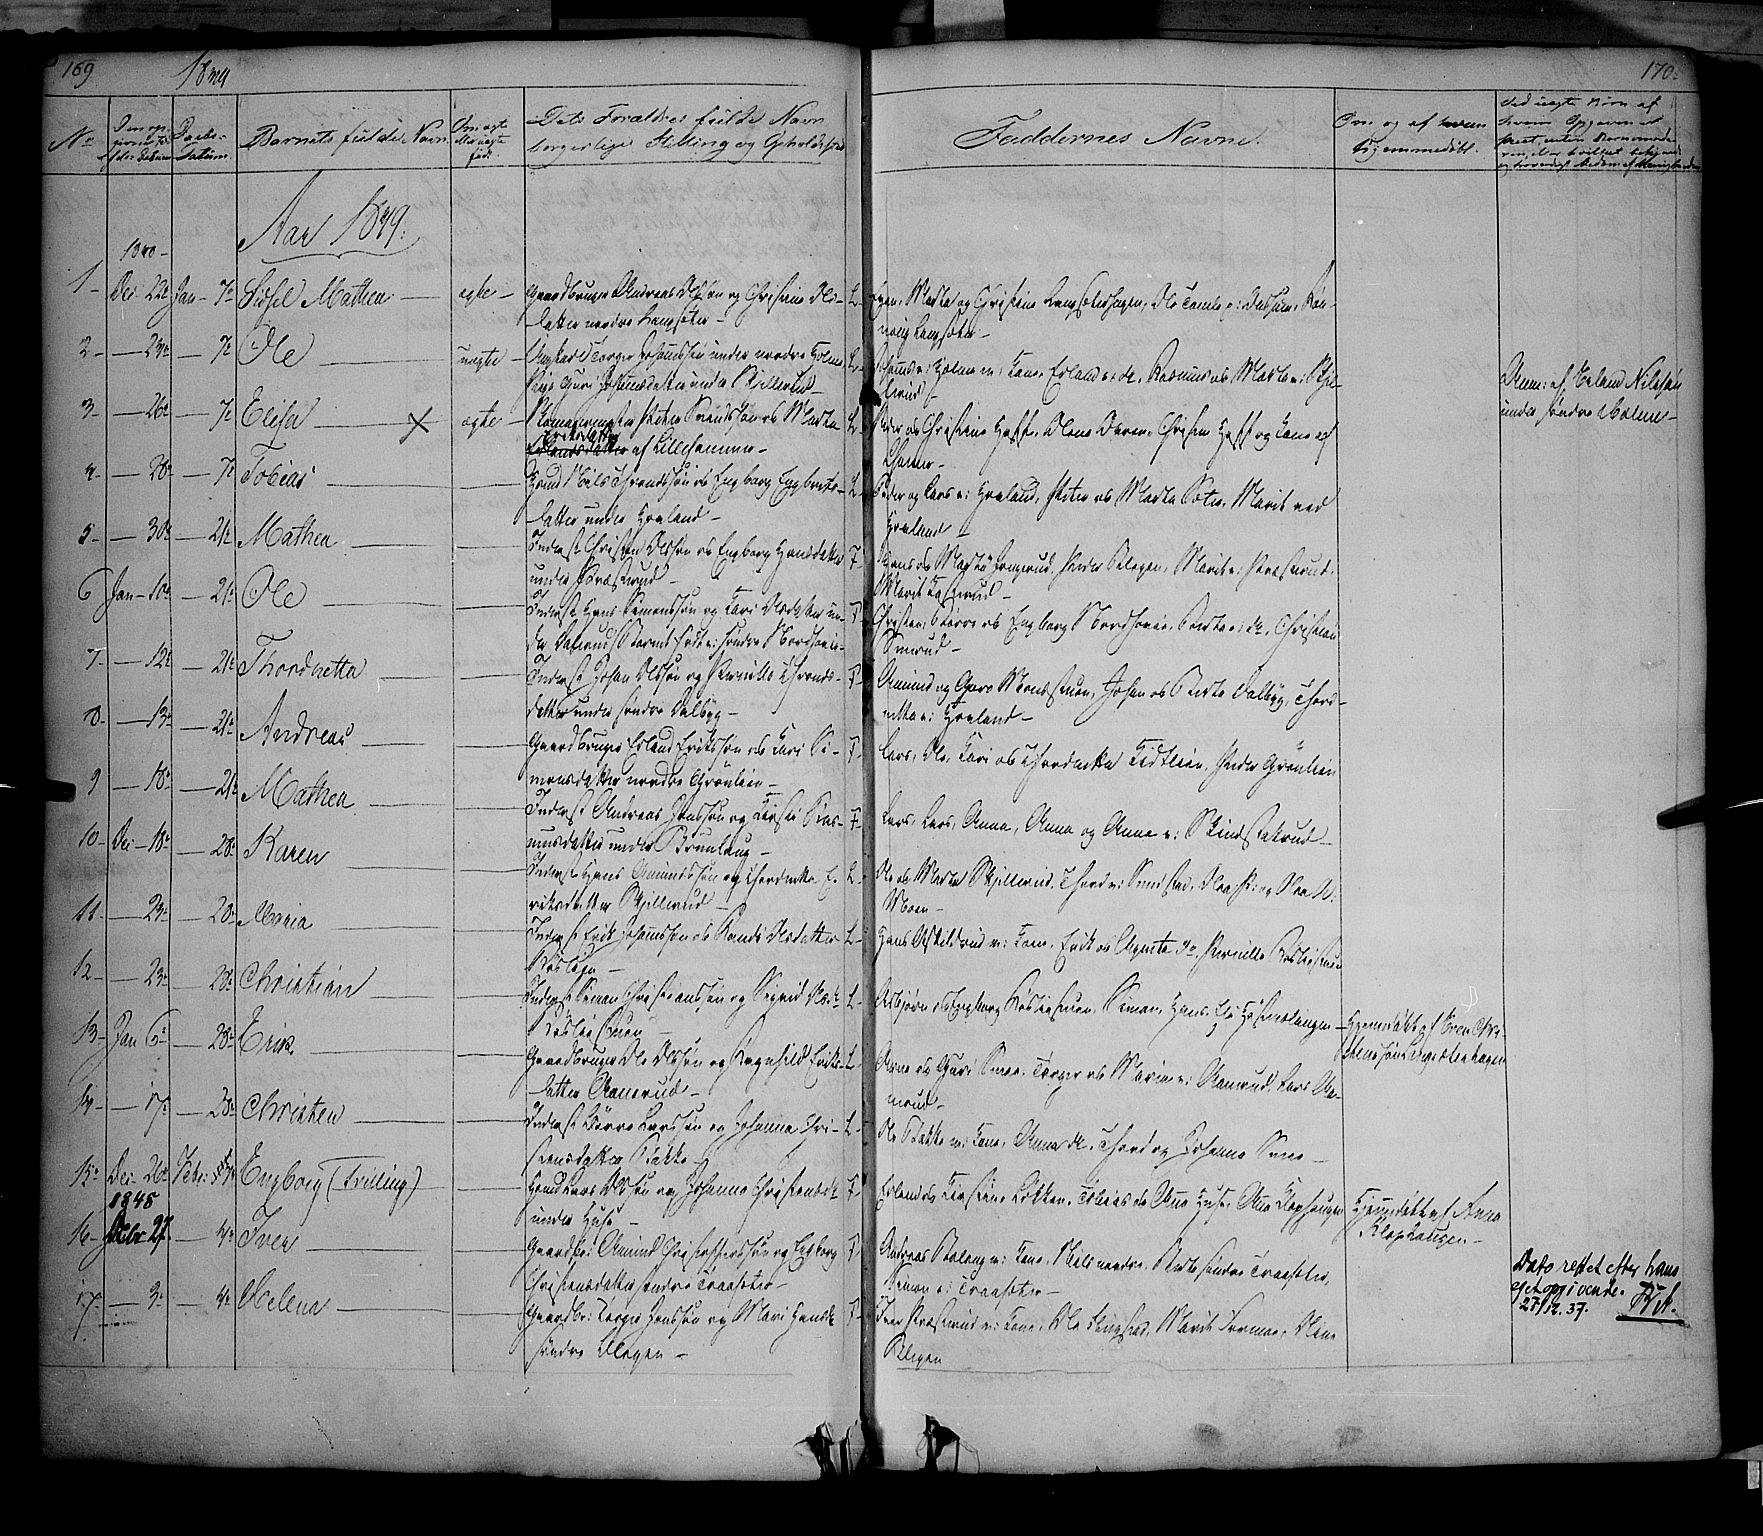 SAH, Fåberg prestekontor, Ministerialbok nr. 5, 1836-1854, s. 169-170